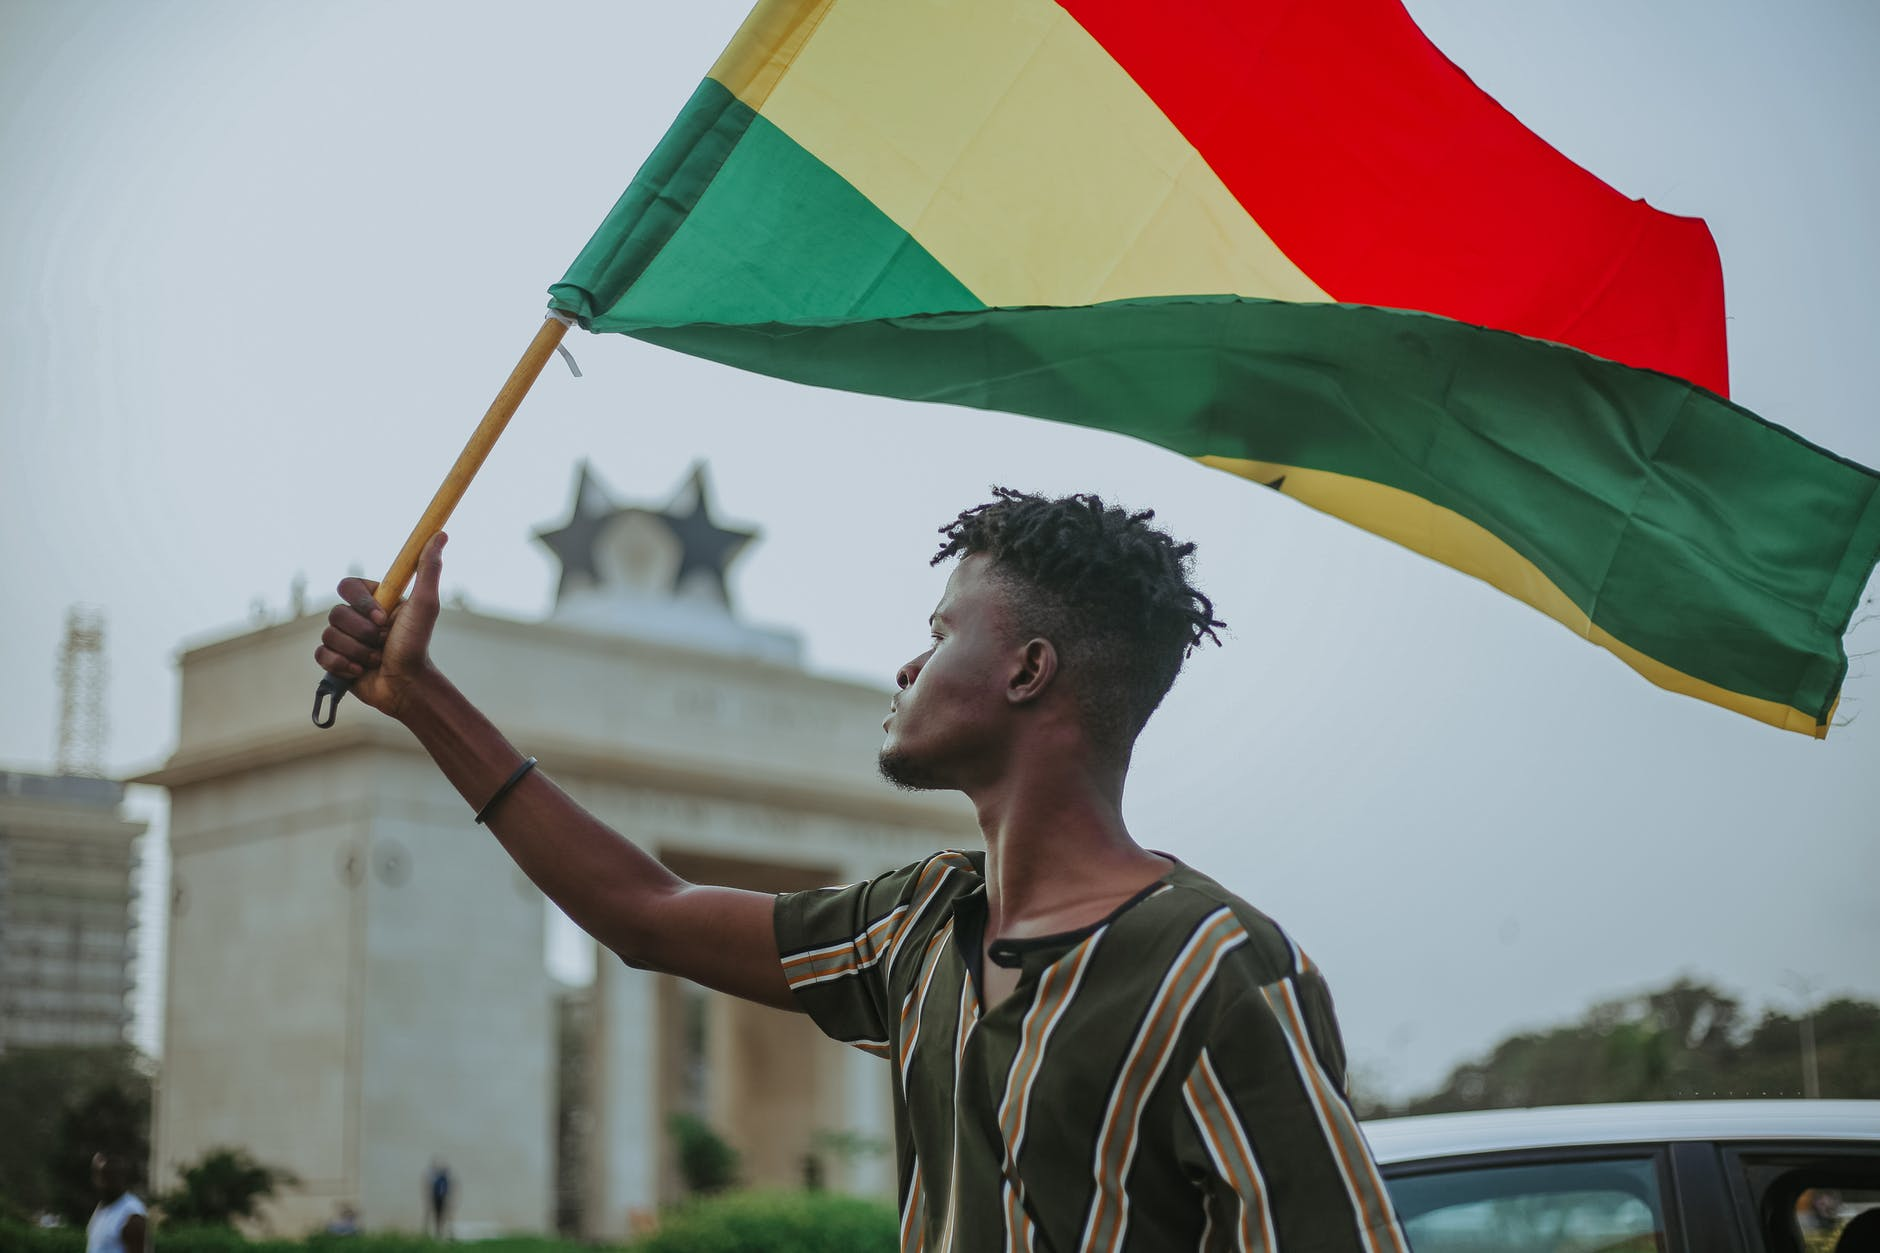 black man with flag of ghana on city street